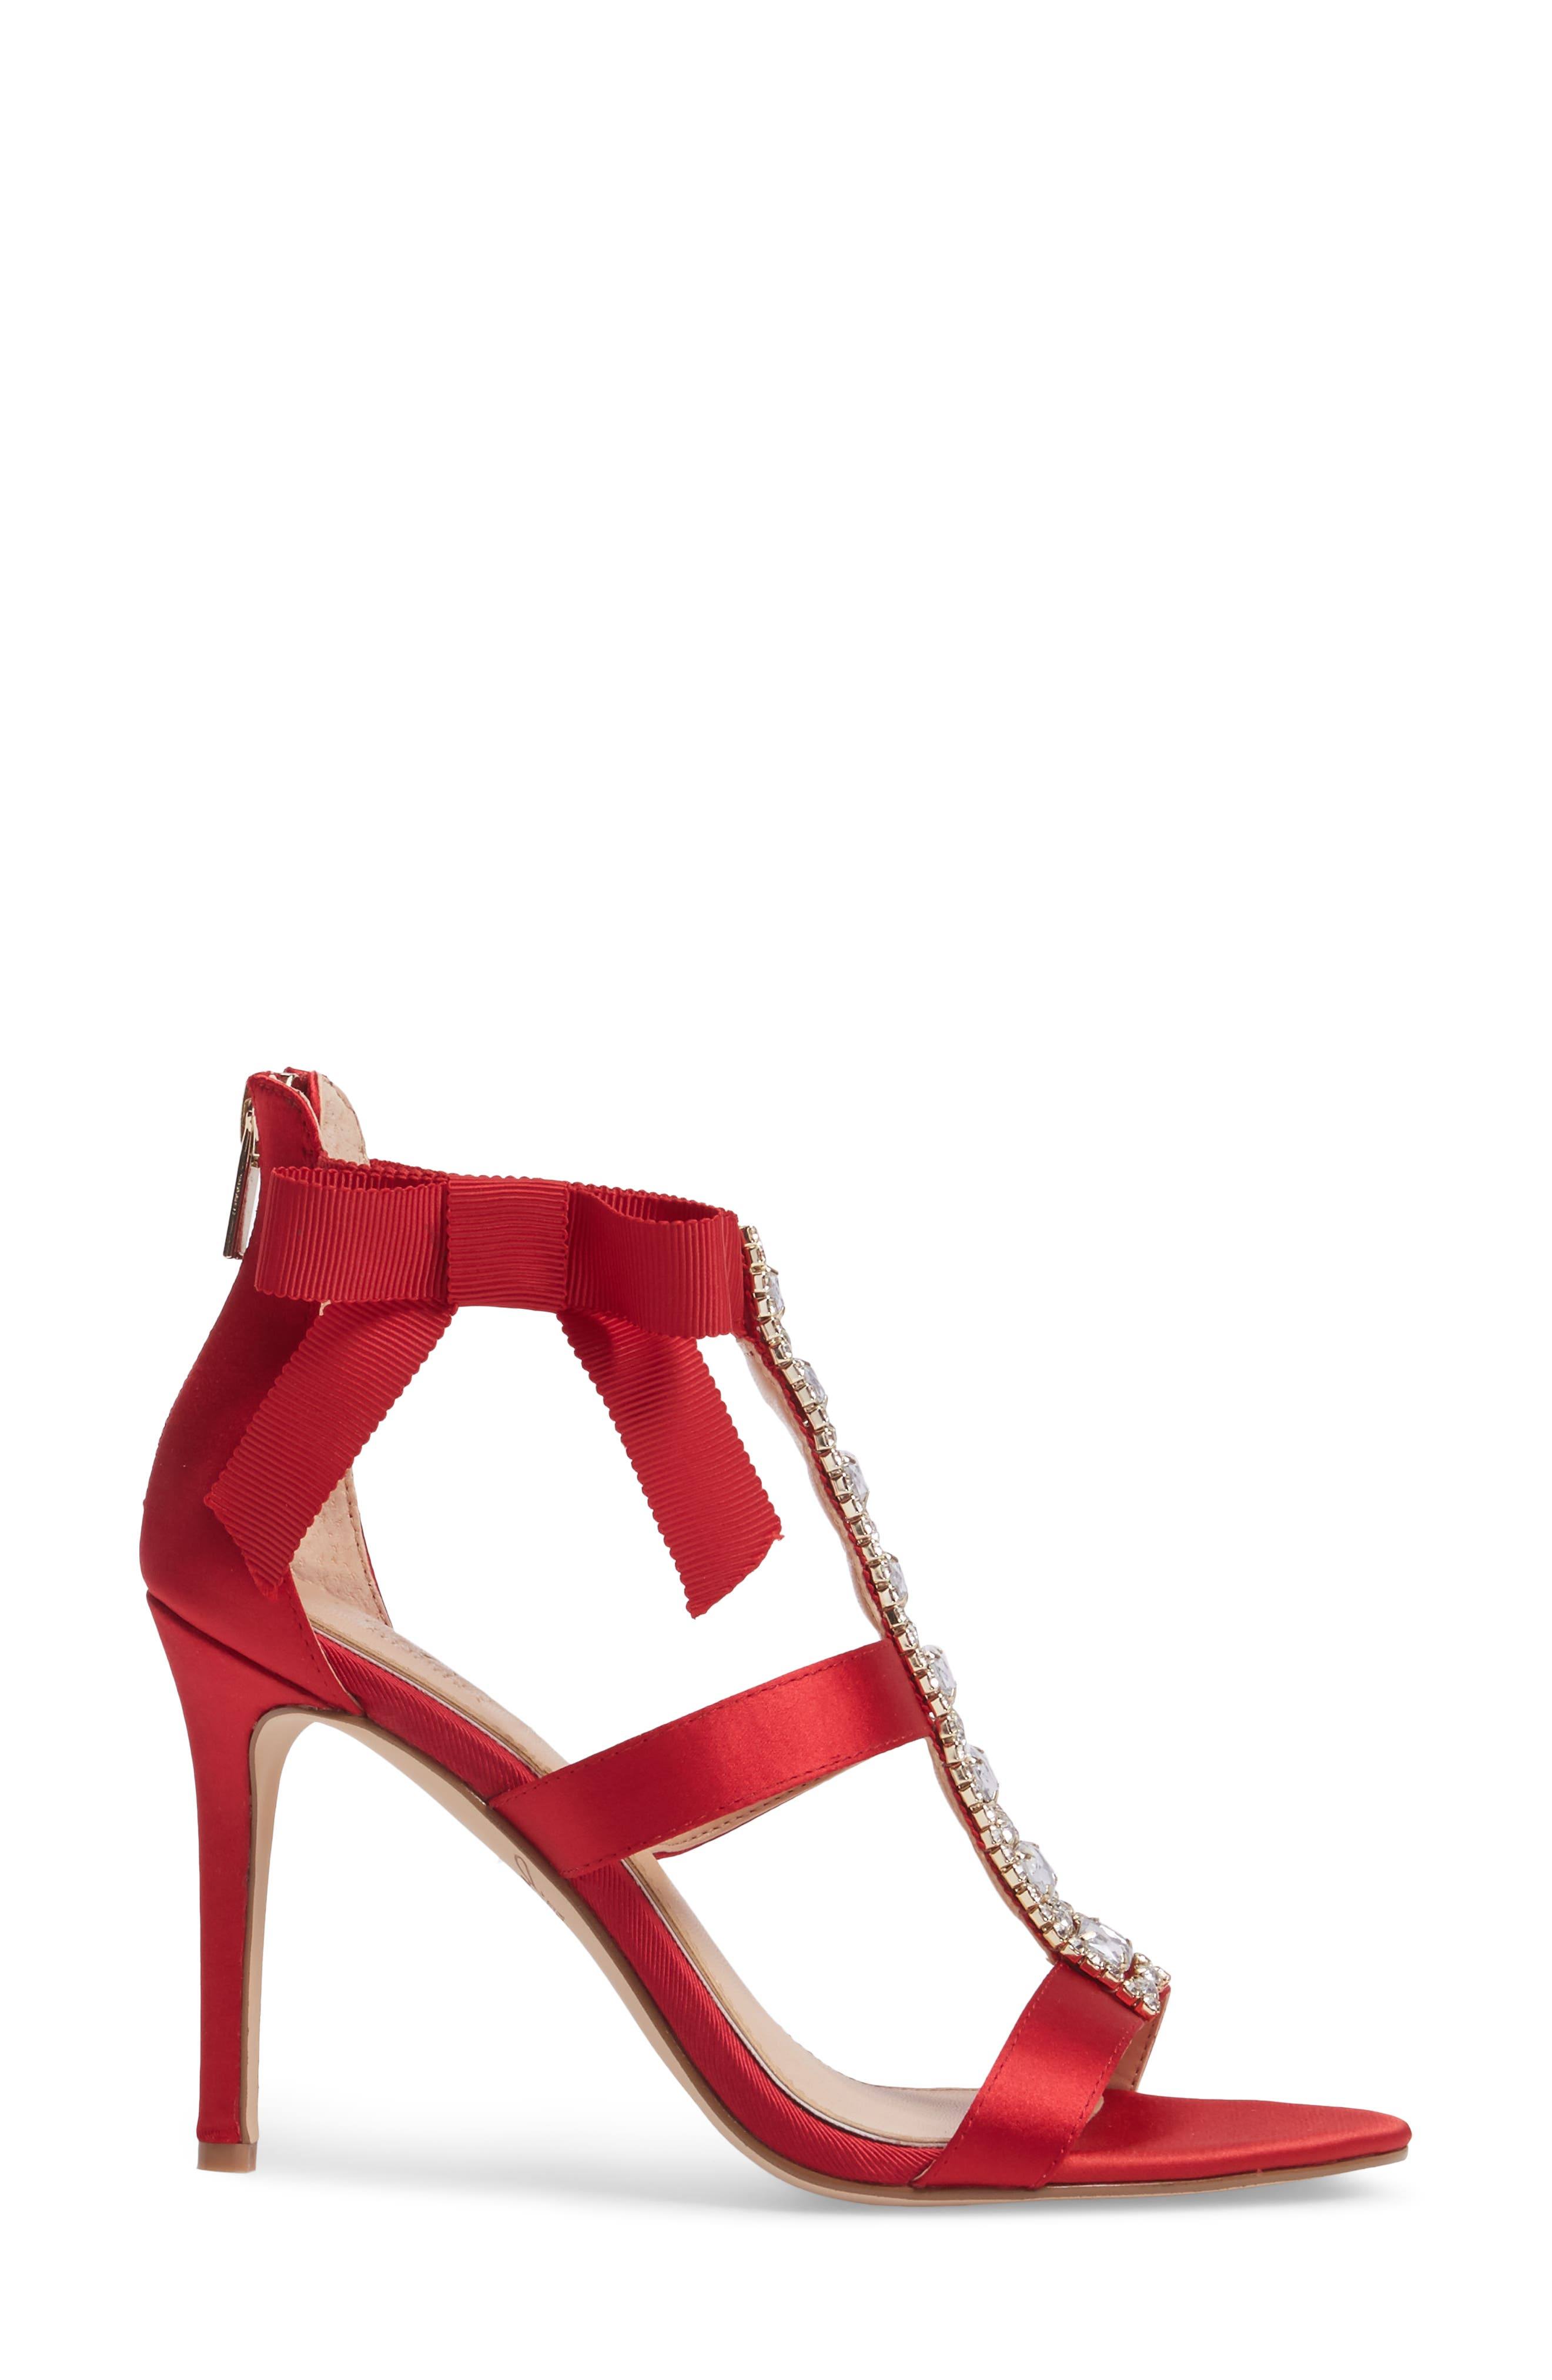 Henderson Embellished Bow Sandal,                             Alternate thumbnail 3, color,                             RED SATIN